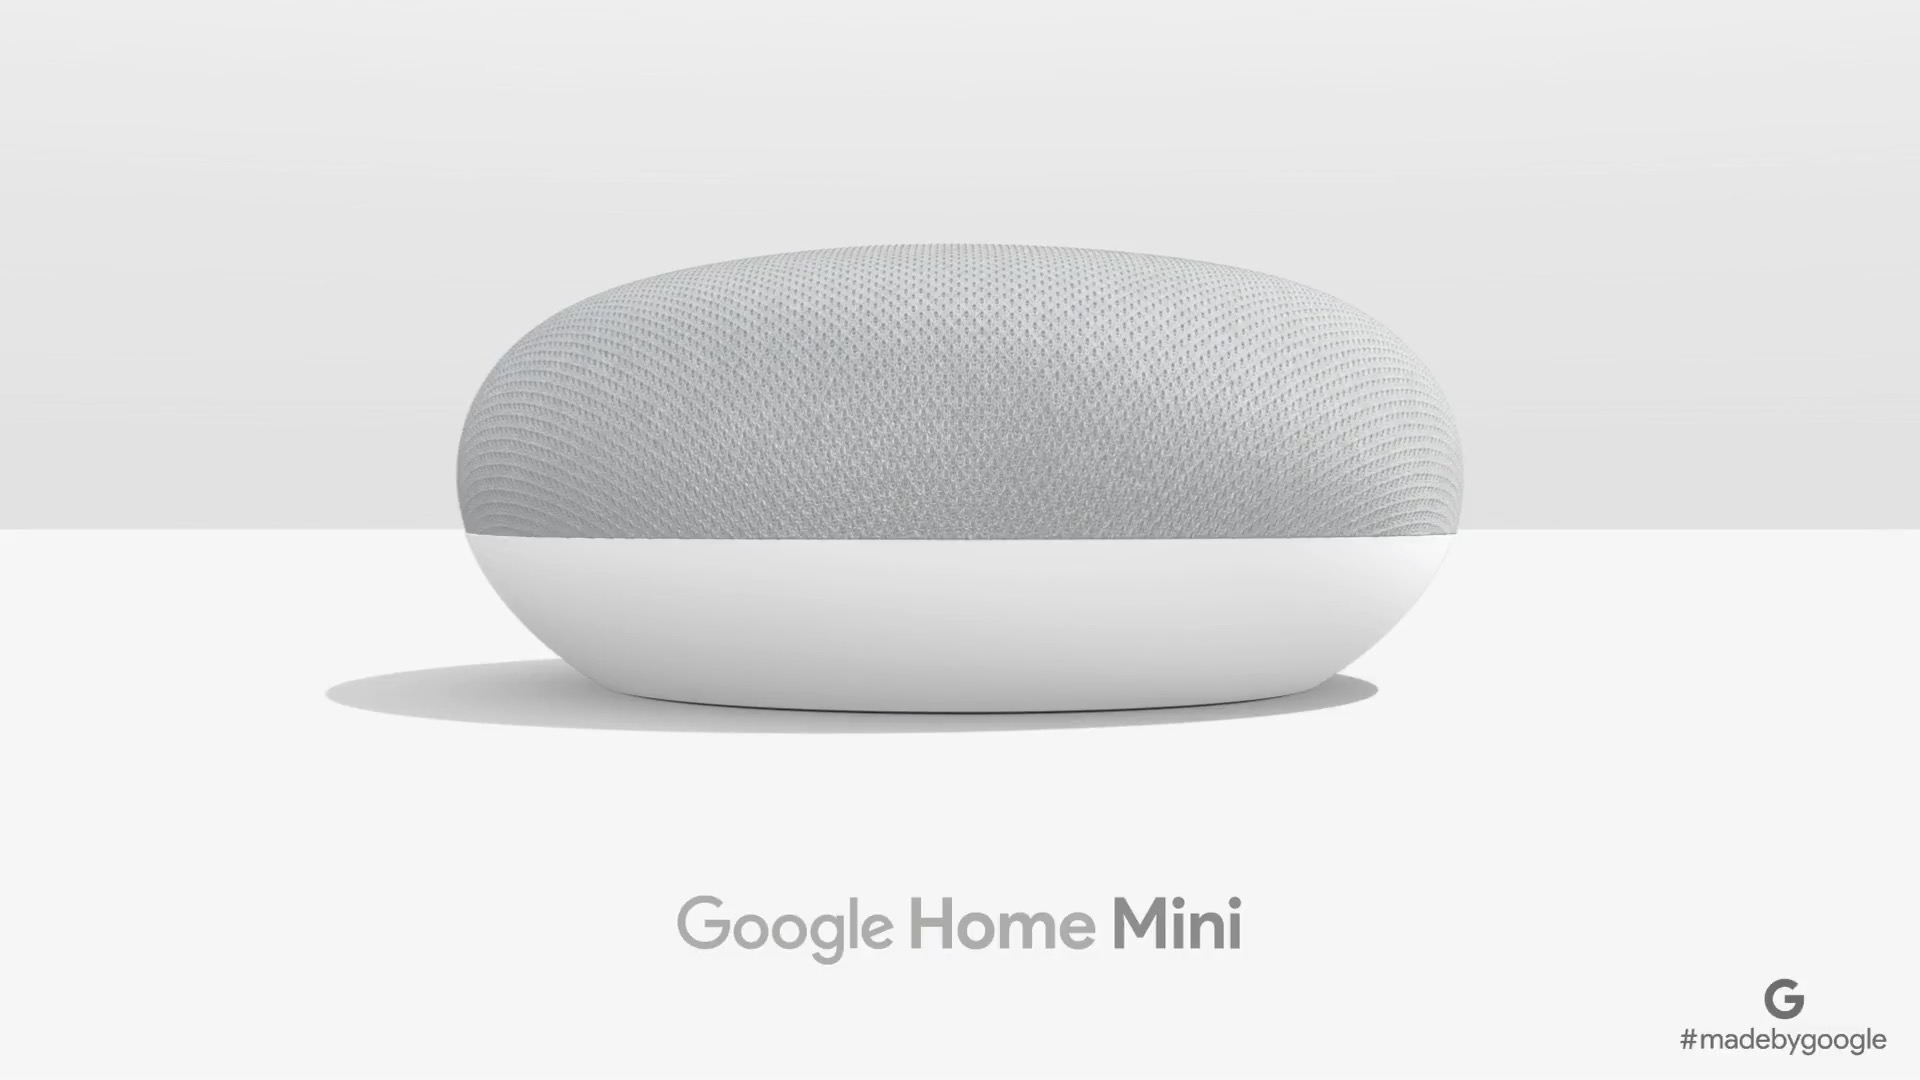 Keluhan Mengenai Google Home Mini Jelang Peluncurannya